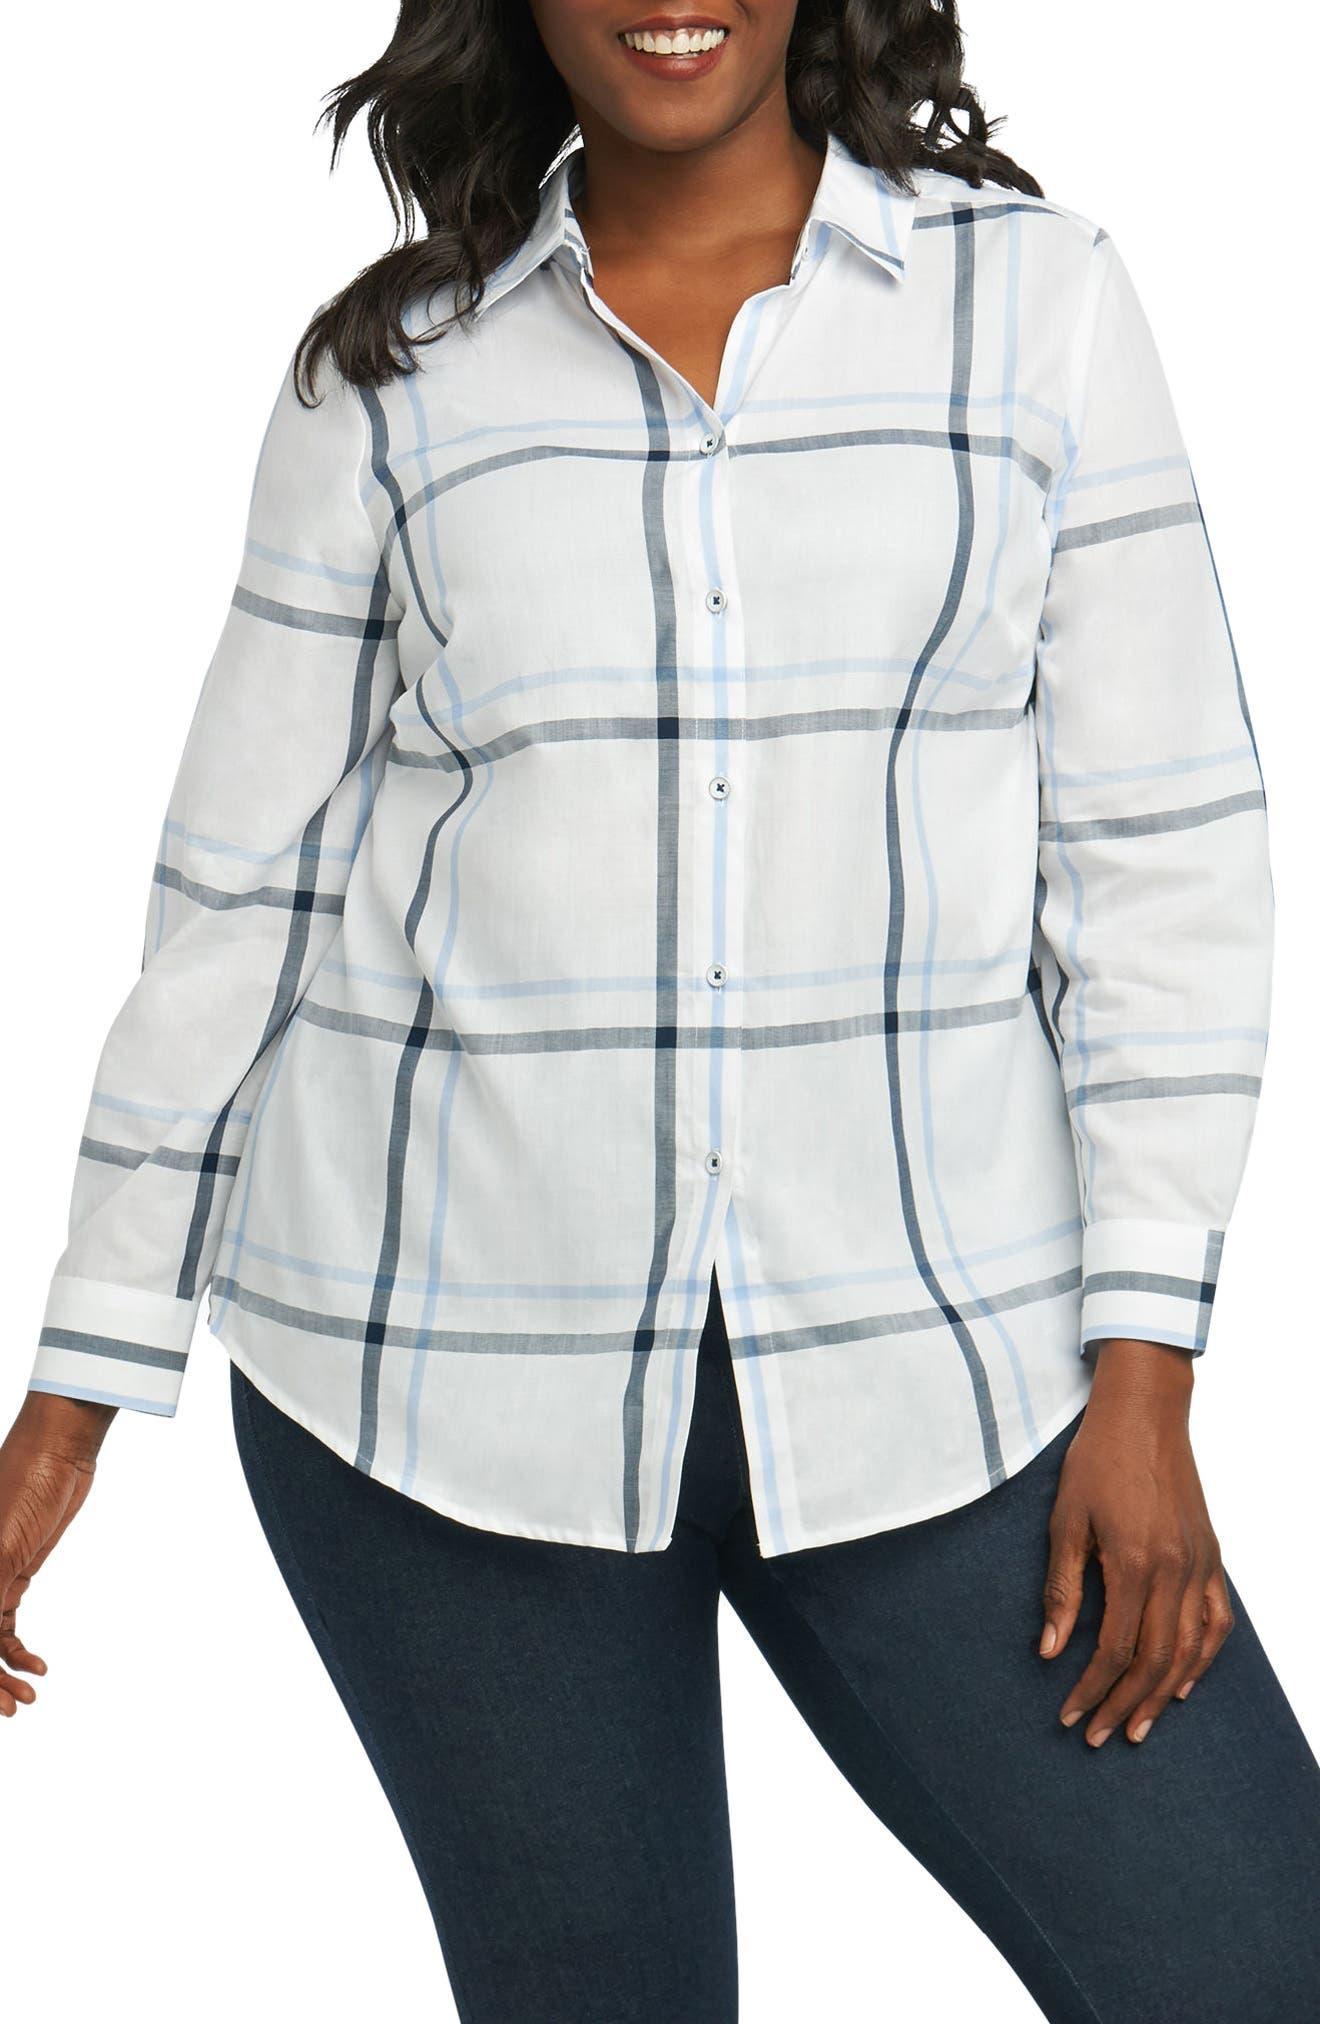 Alternate Image 1 Selected - Foxcroft Coralie Plaid Woven Shirt (Plus Size)